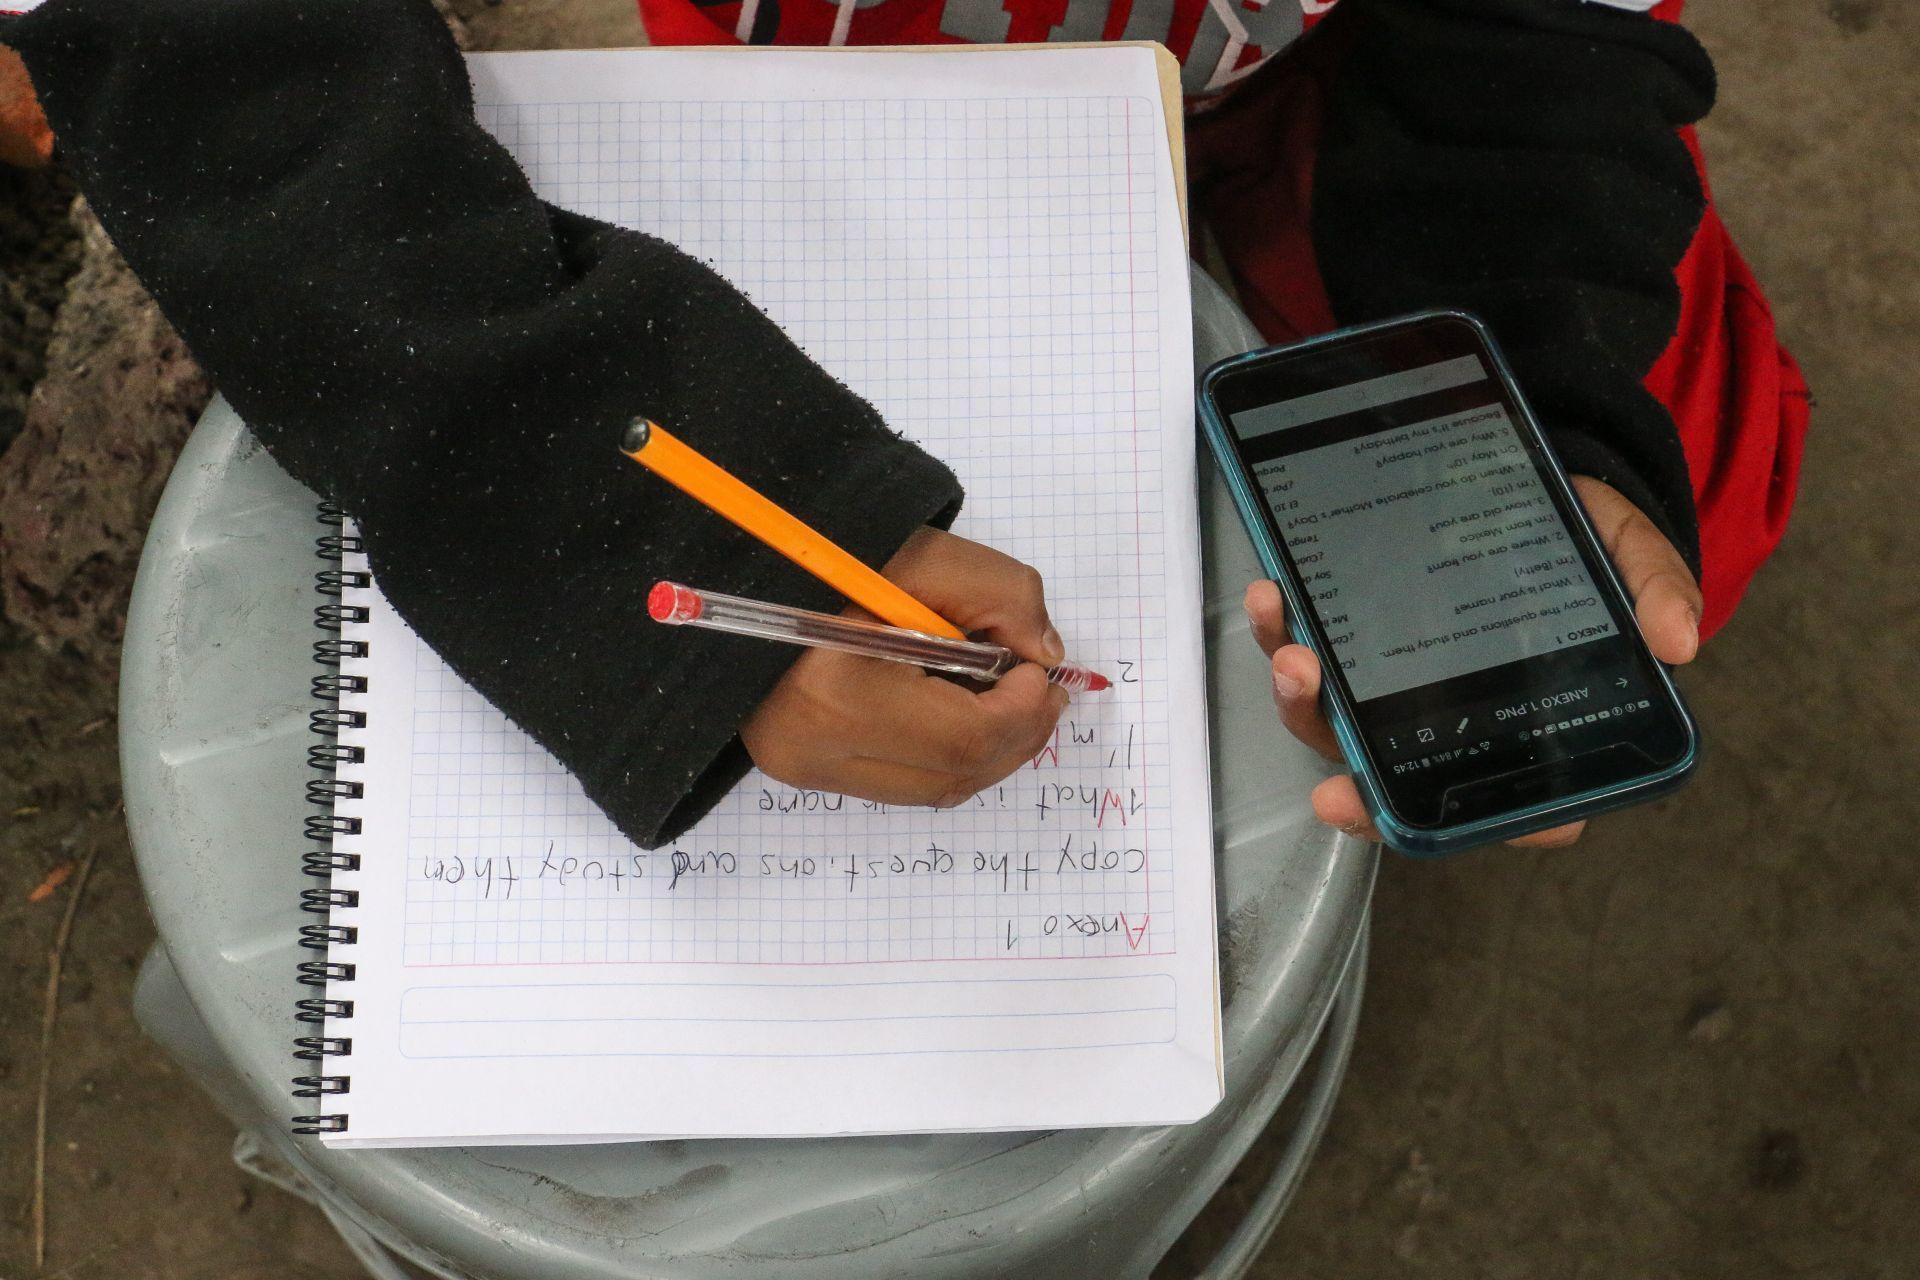 """Bájeme la voz, malcriada"": Maestro explota contra alumna"